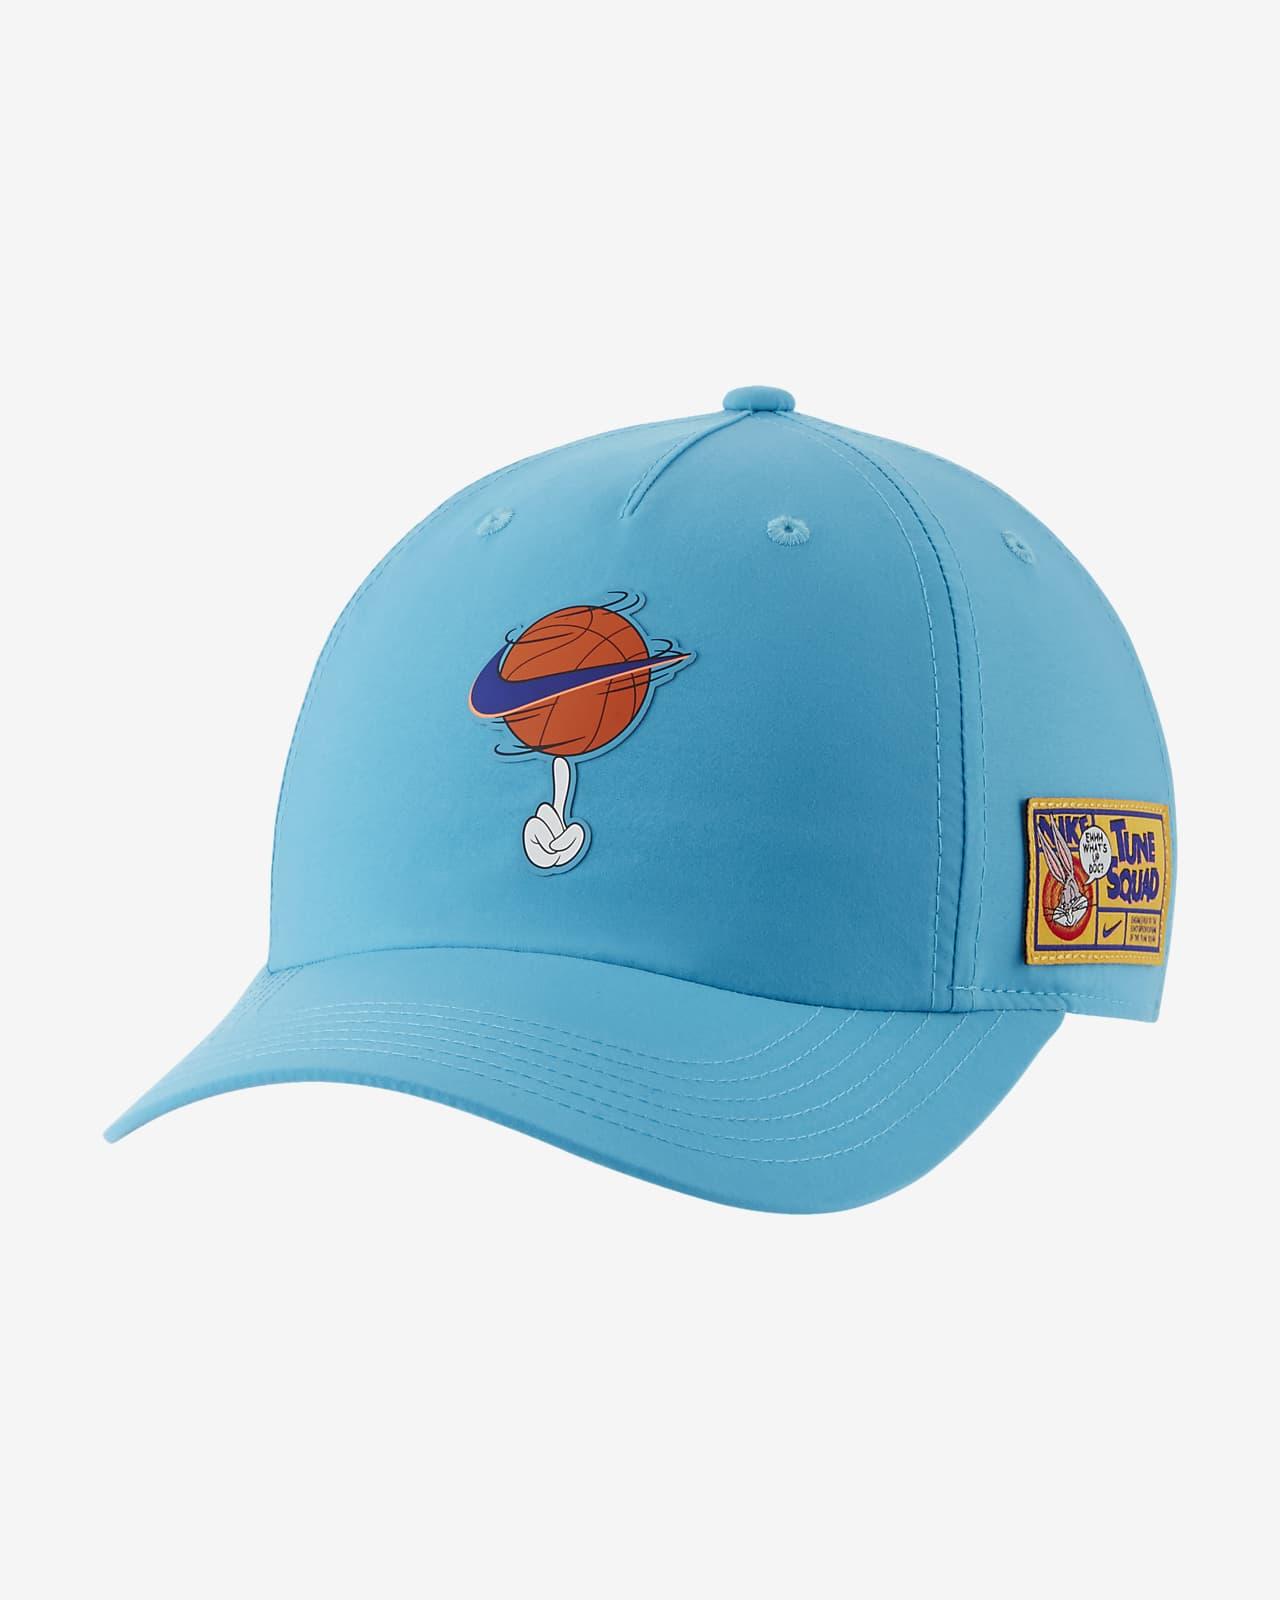 Nike Heritage86 x Space Jam: A New Legacy Kids' Adjustable Hat